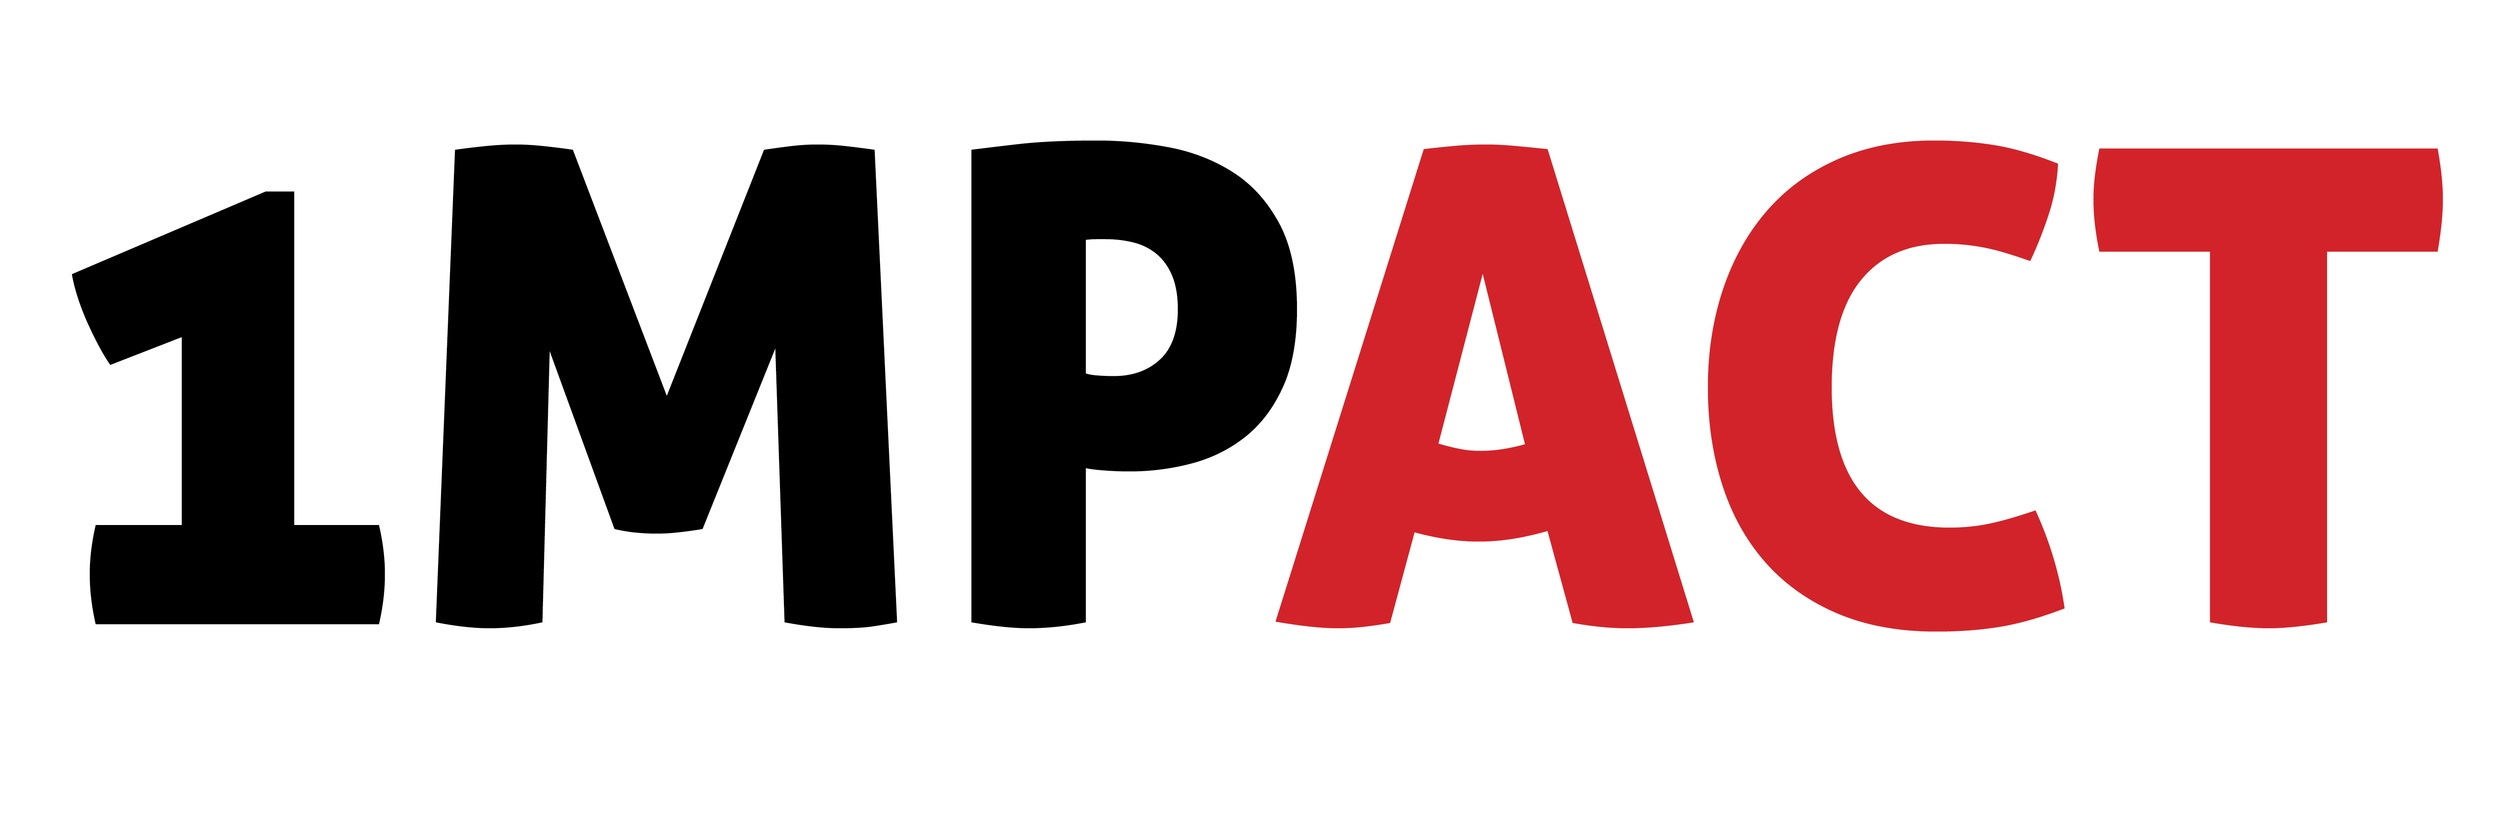 1mpact+Logo